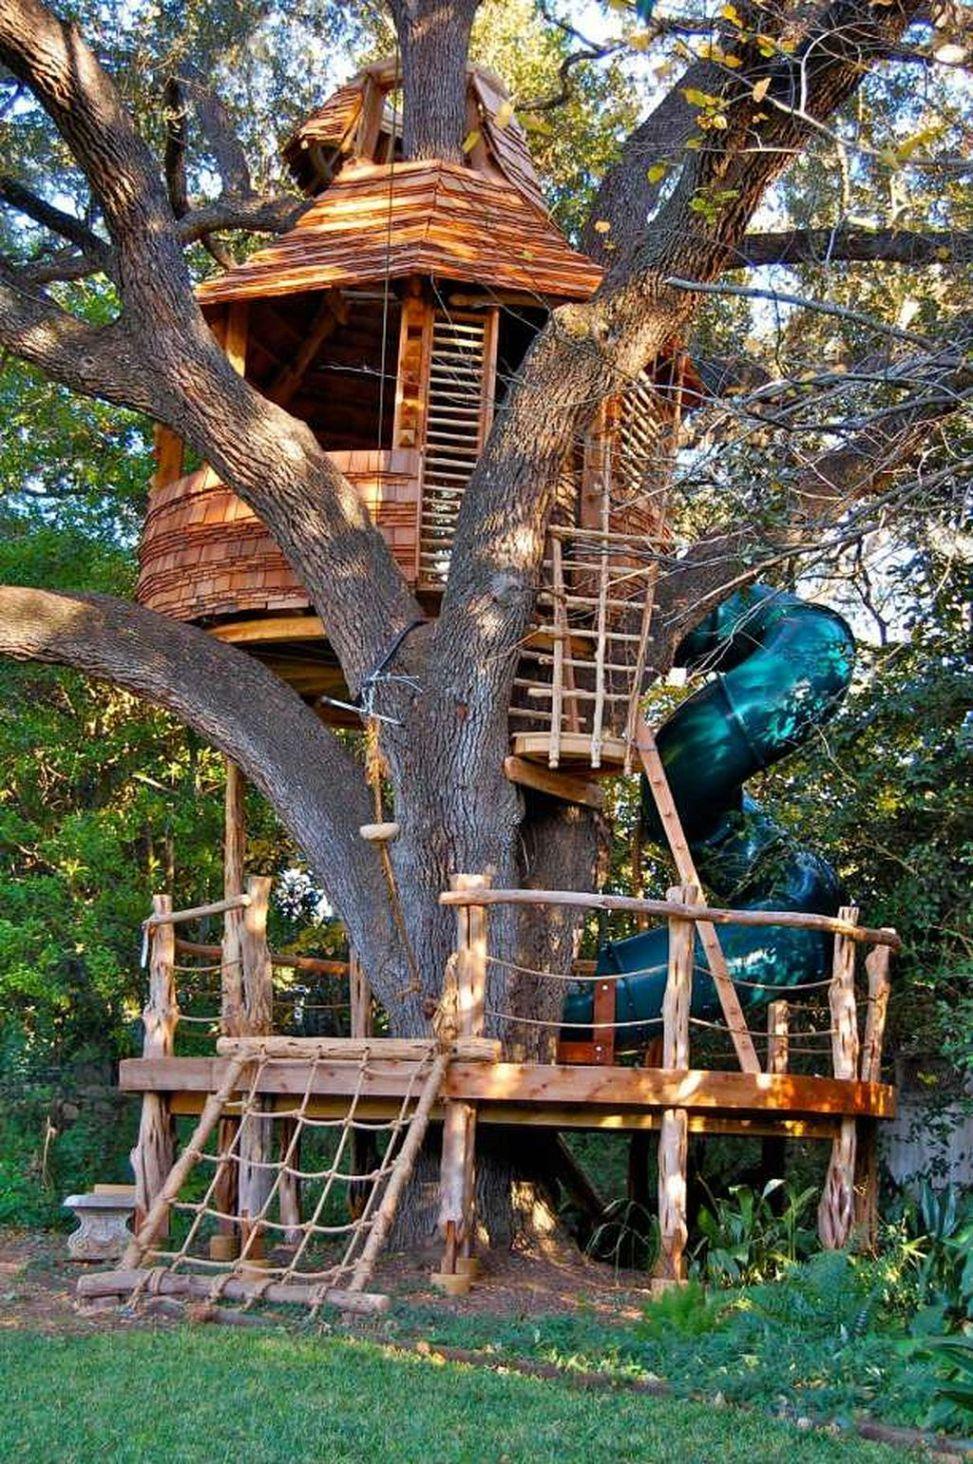 Wonderful Tree House You Ll Love It 19 Tree House Kids Tree House Diy Cool Tree Houses Backyard treehouse treehouse ideas